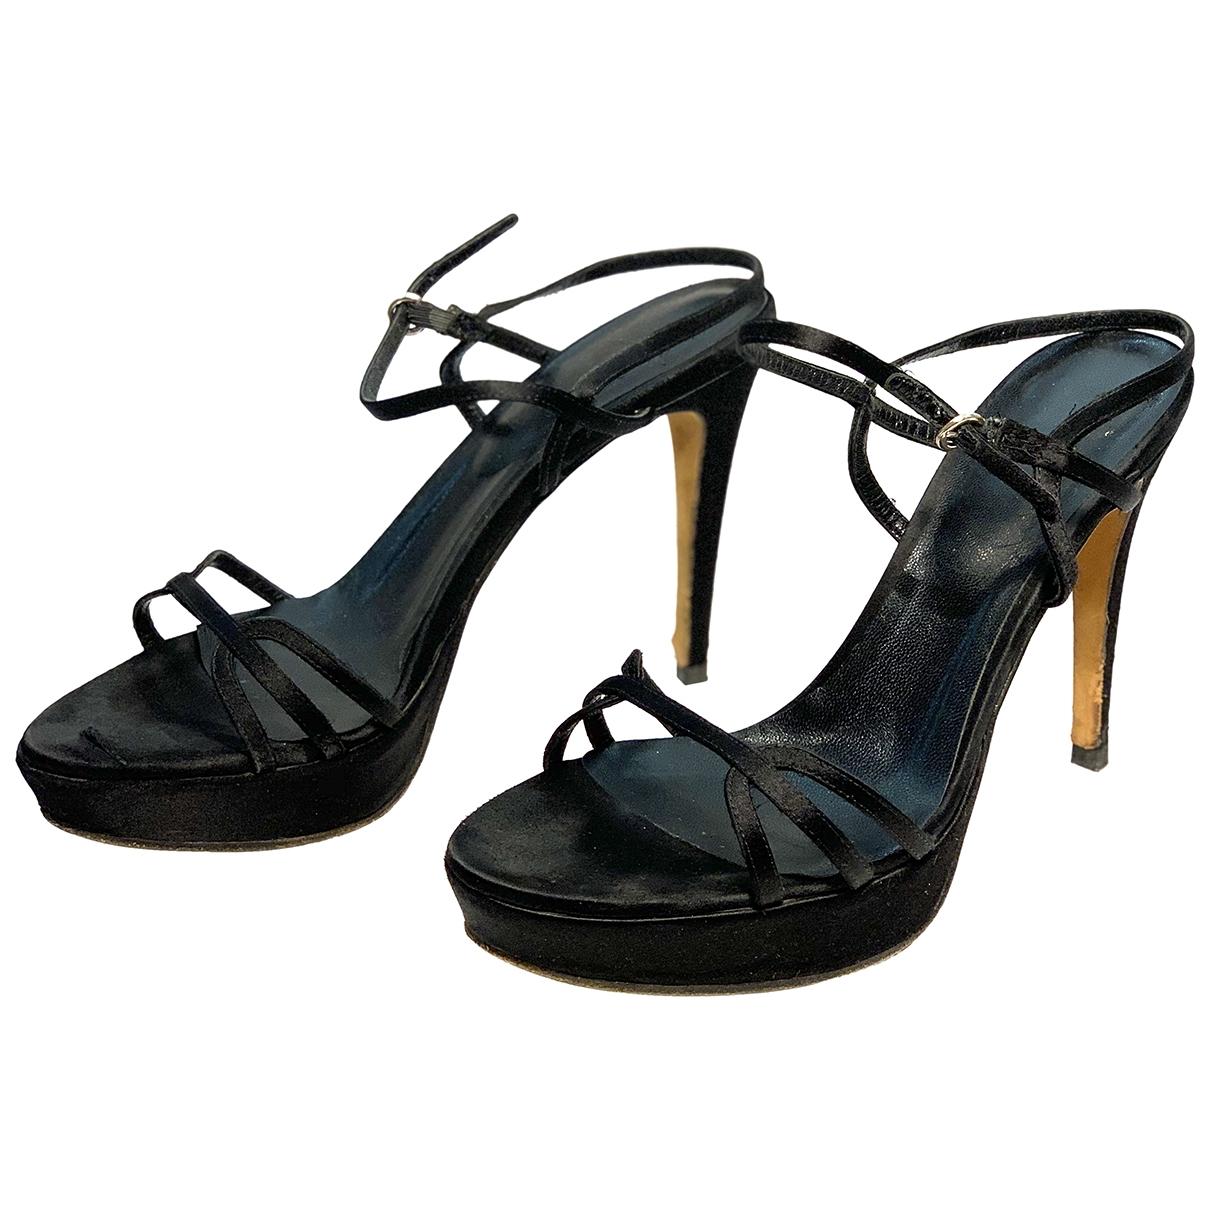 Sandalias romanas de Cuero Moschino